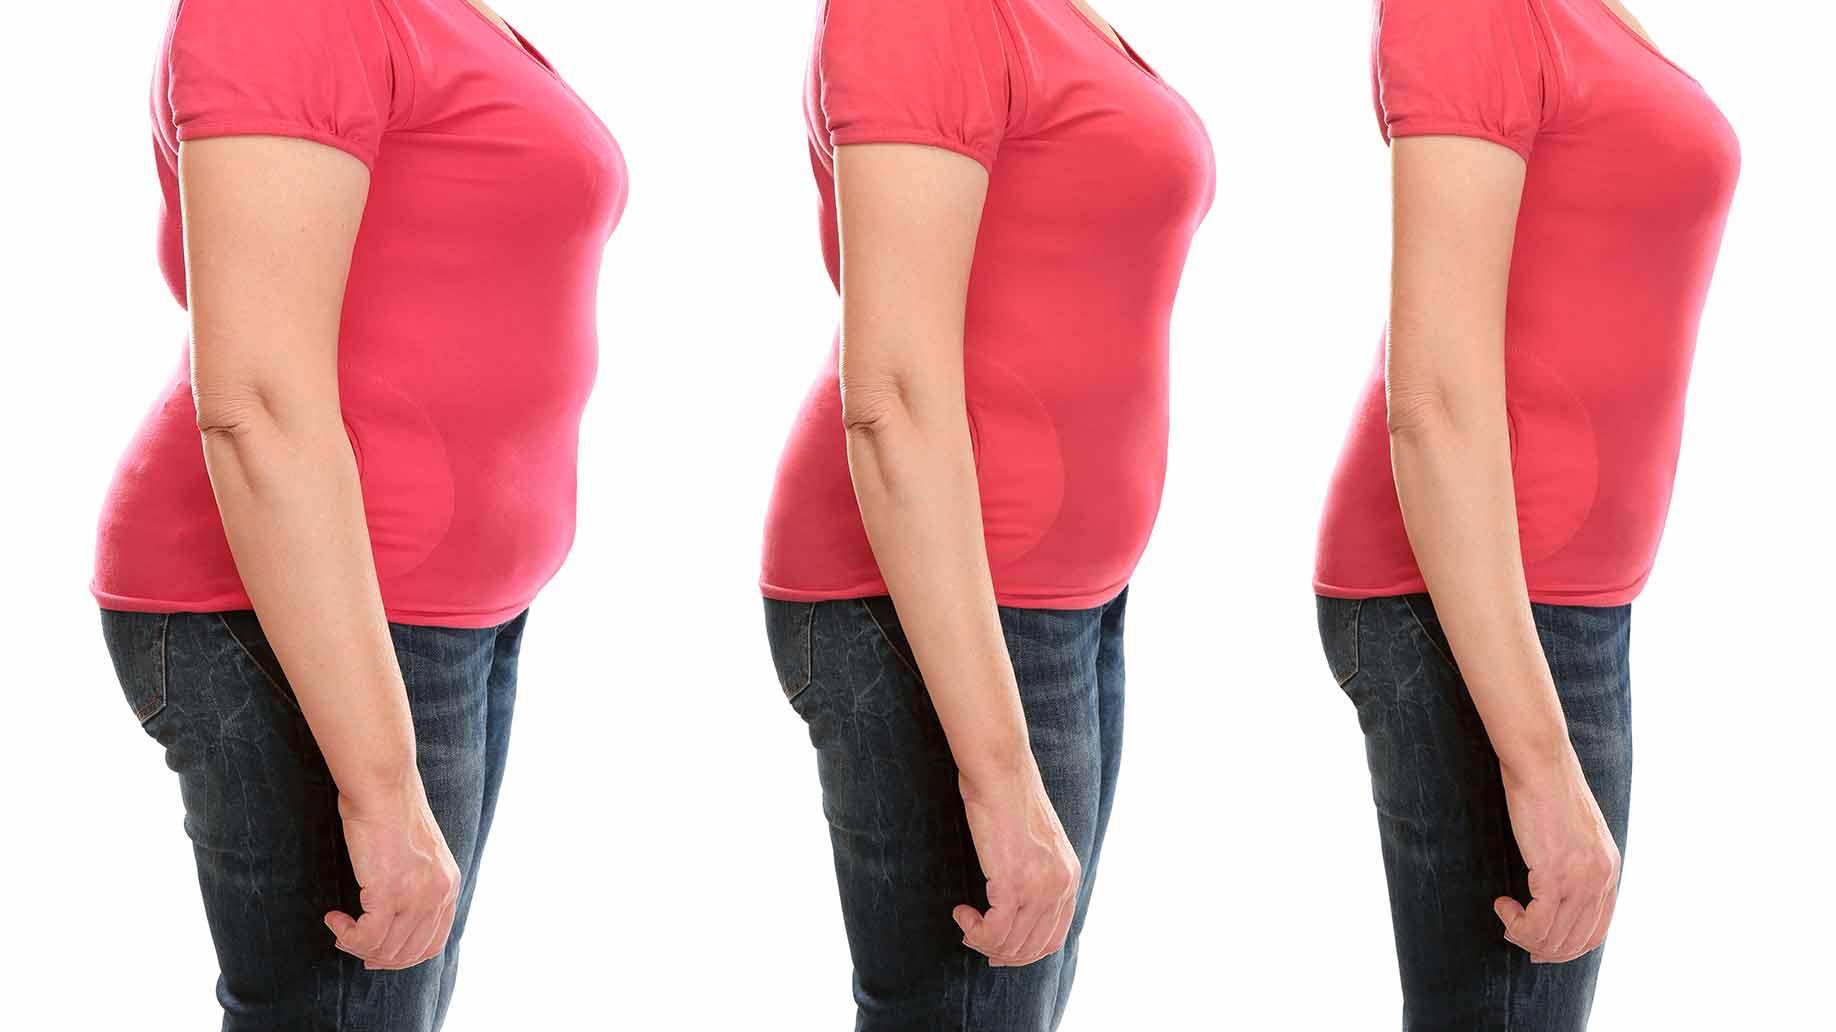 weight loss joint pain overweight stress arthritis natural remedies